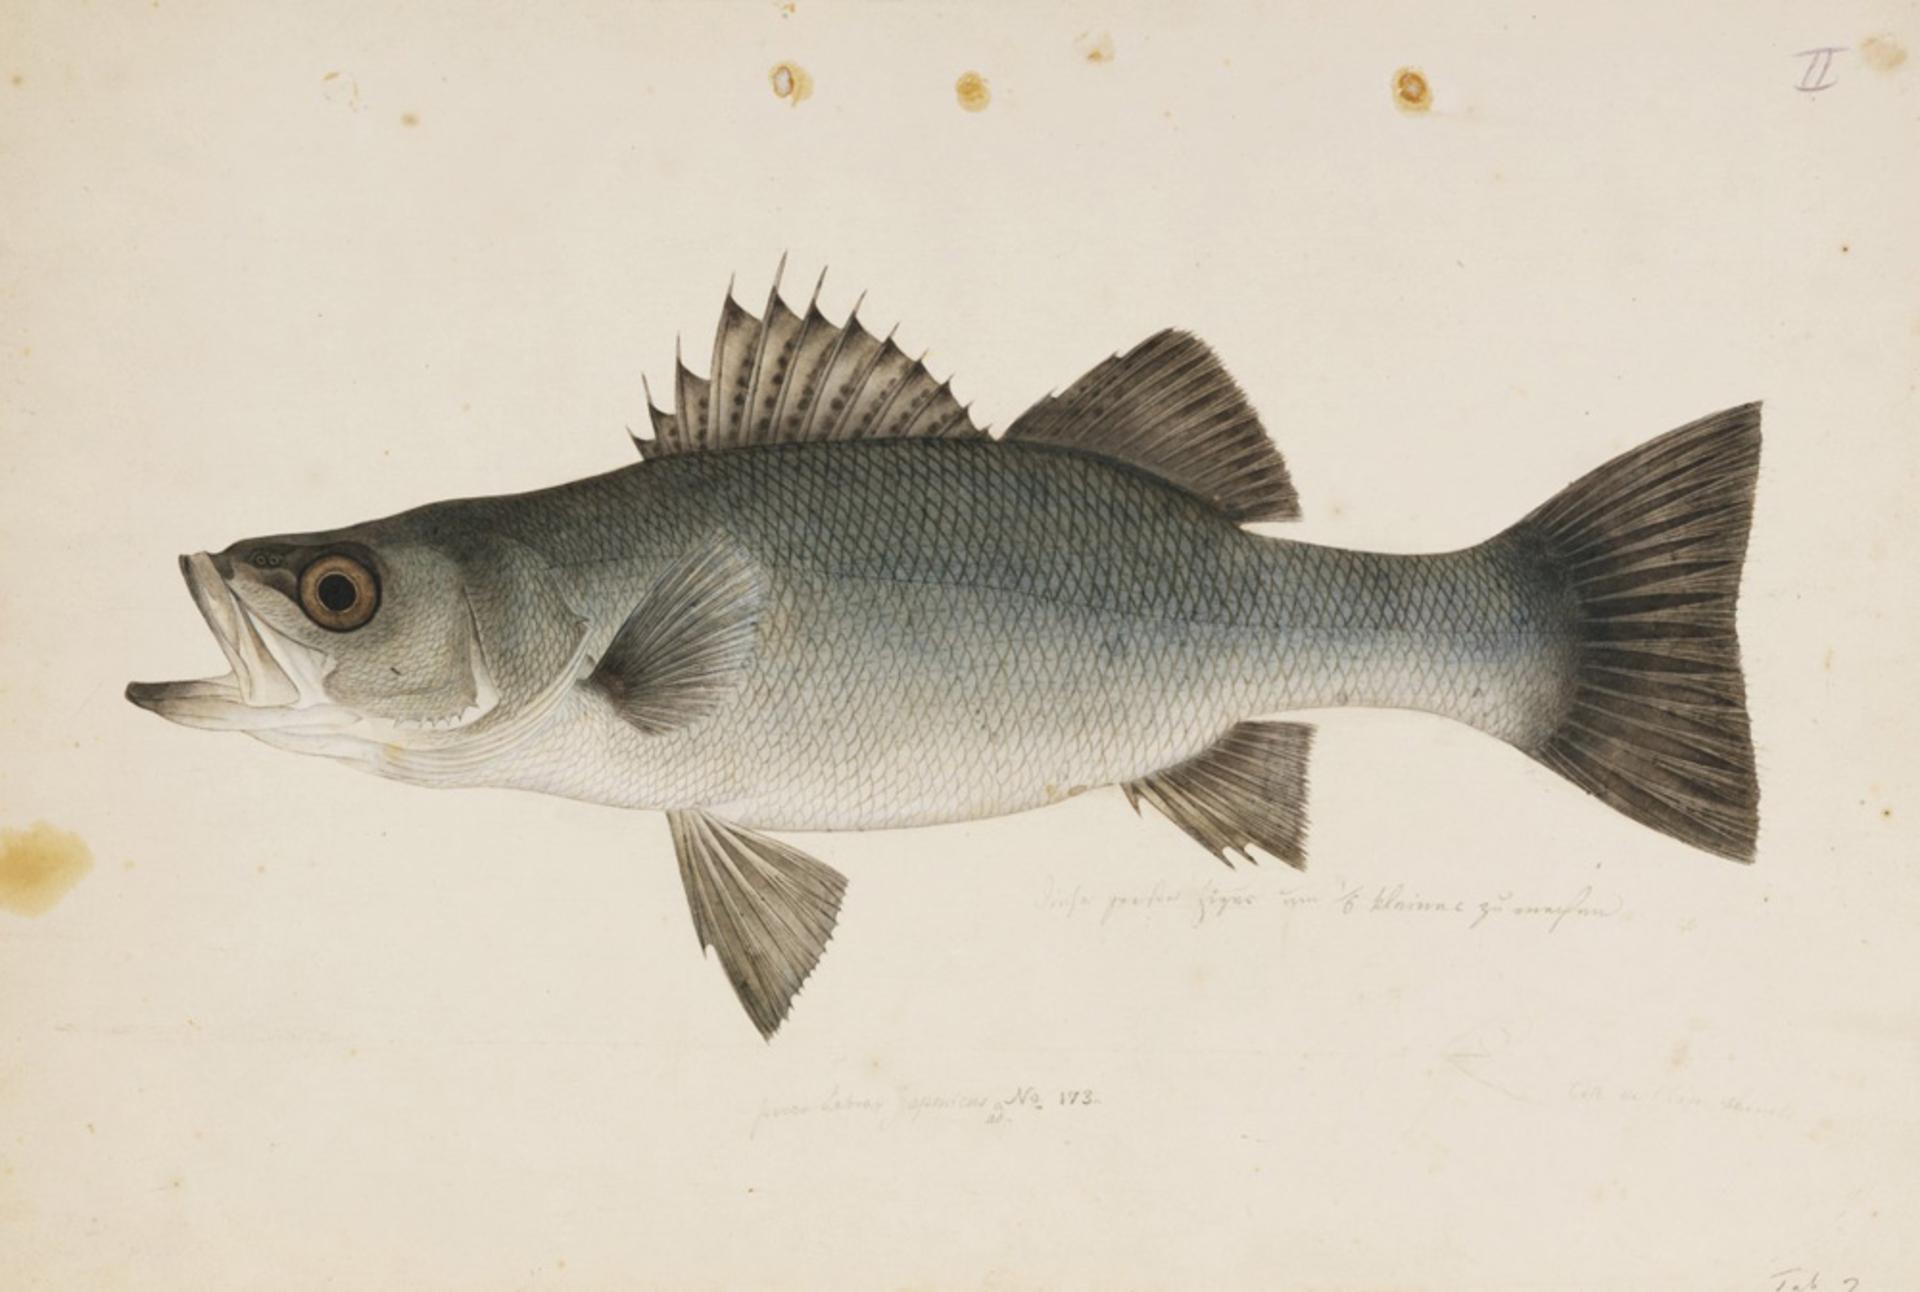 RMNH.ART.186   Lateolabrax japonicus